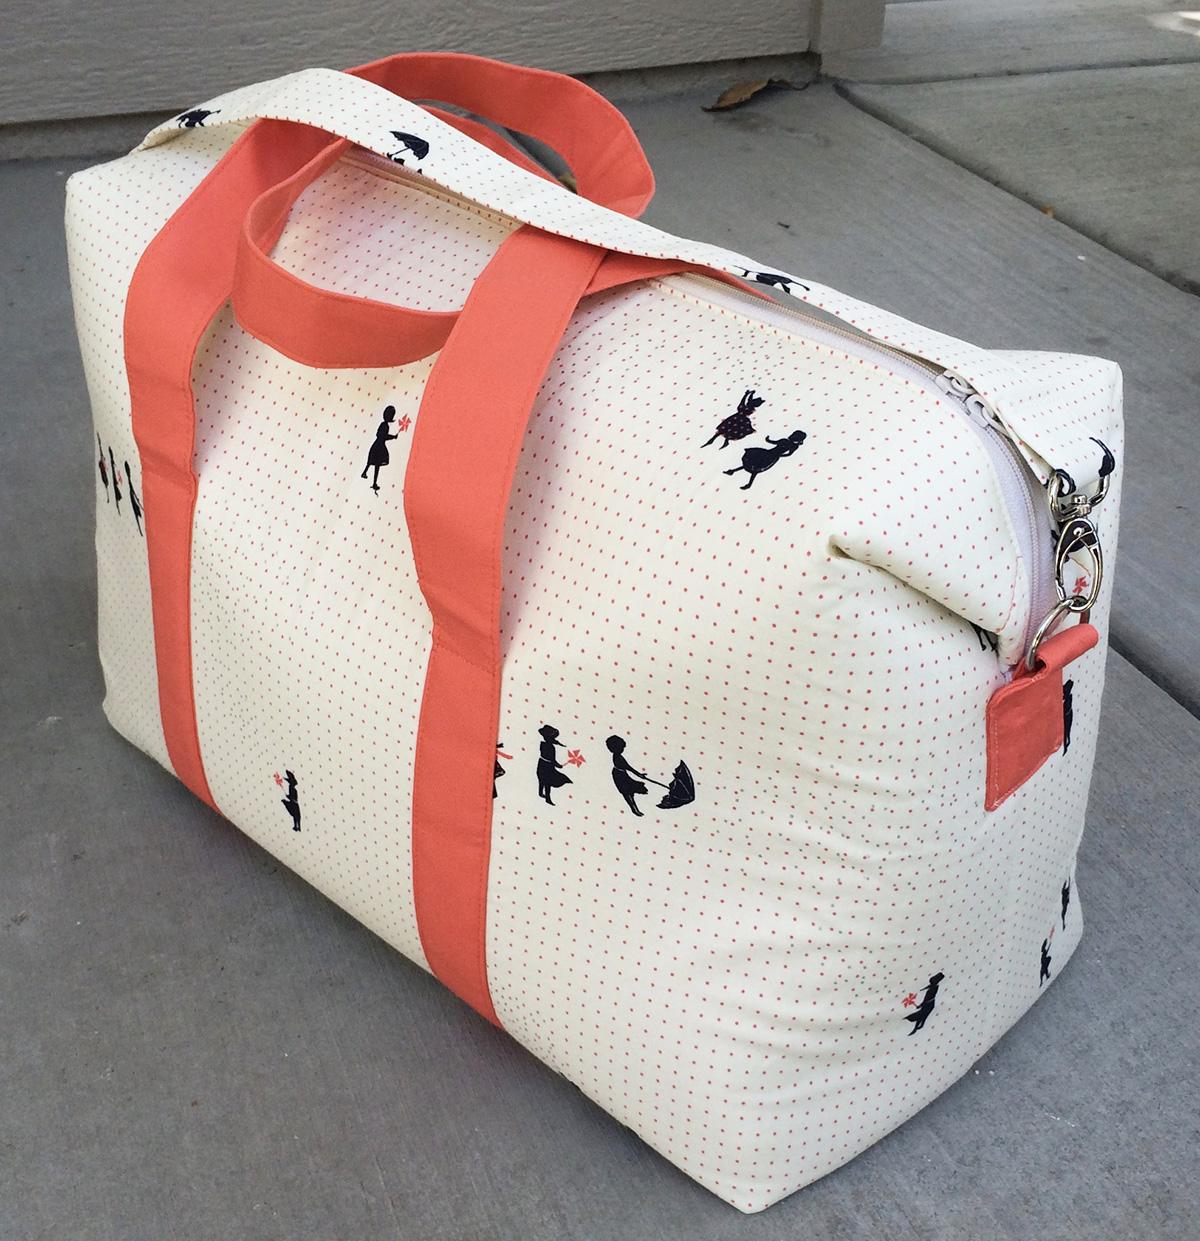 Sew Sweetness Emblem Duffle Bag, sewn by Carina